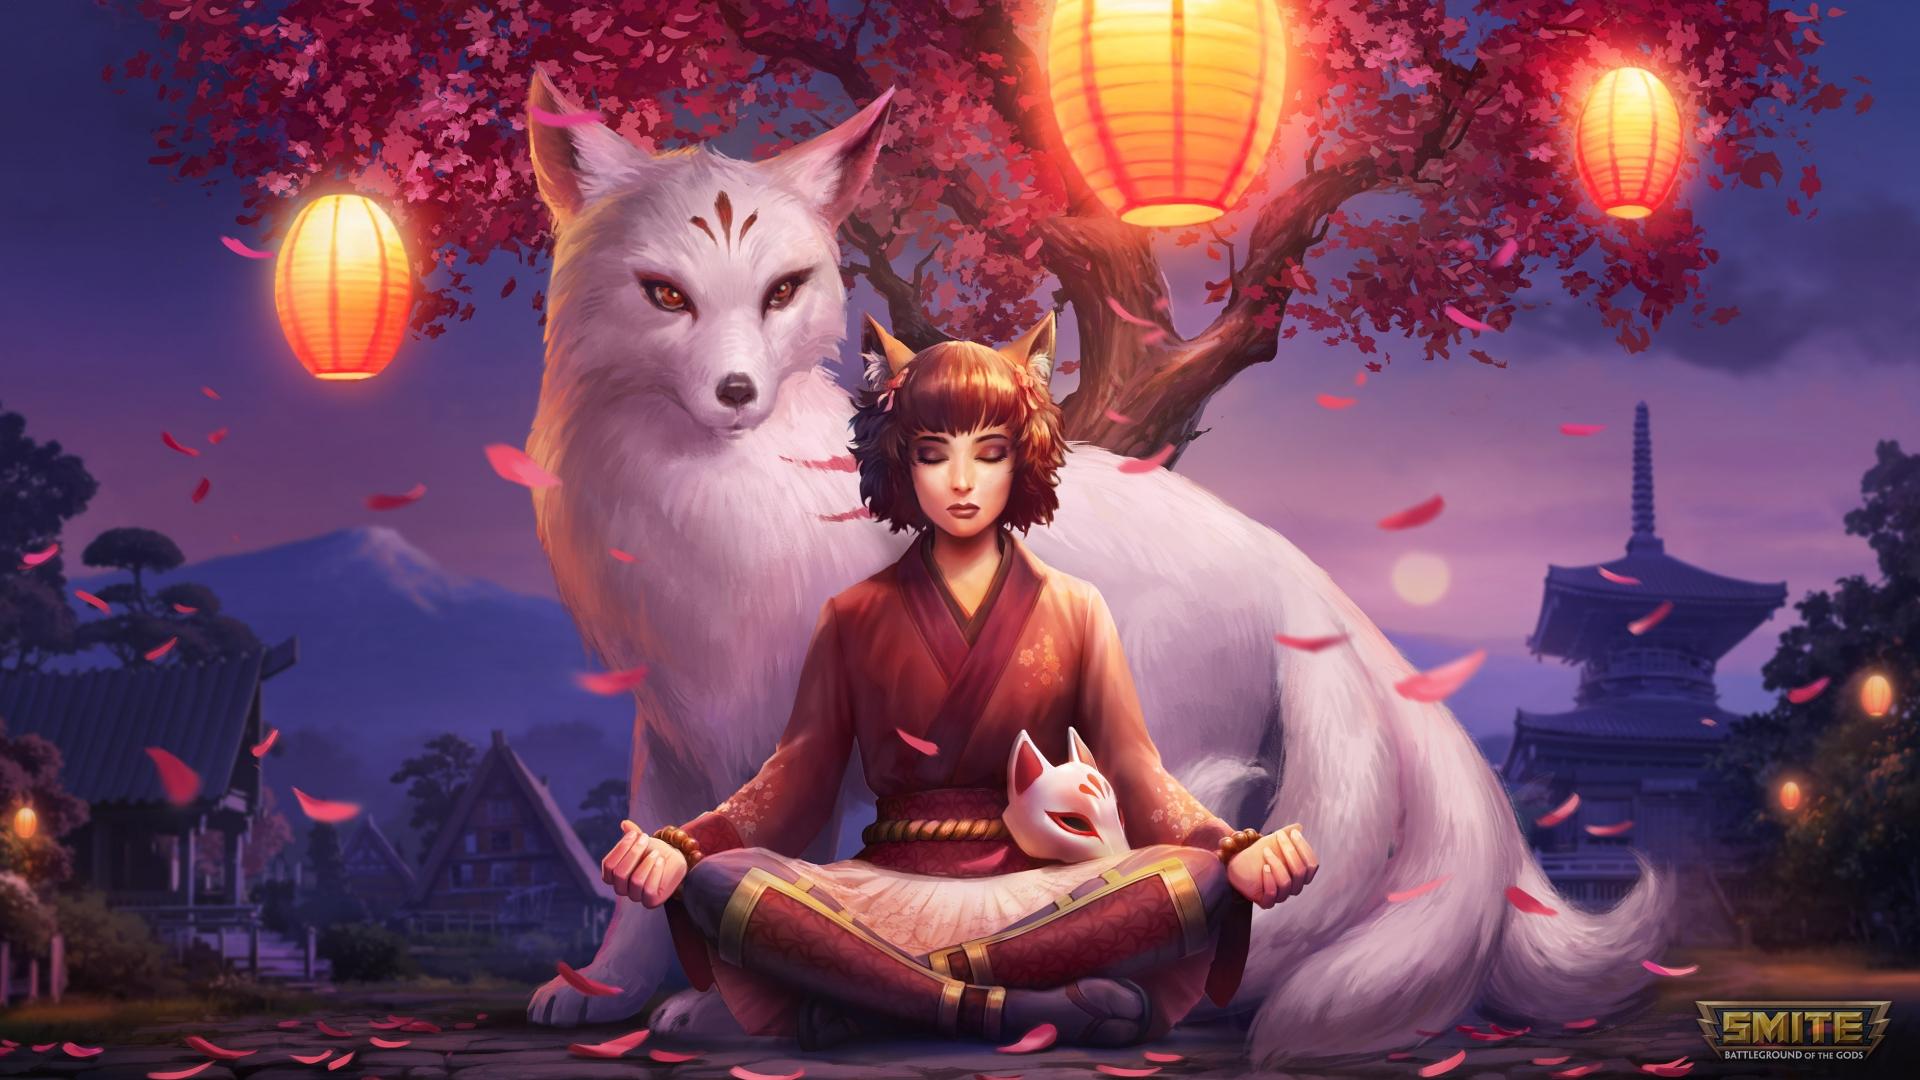 Download 1920x1080 Wallpaper Elf Girl Smite Video Game Meditation Full Hd Hdtv Fhd 1080p 1920x1080 Hd Image Background 22390